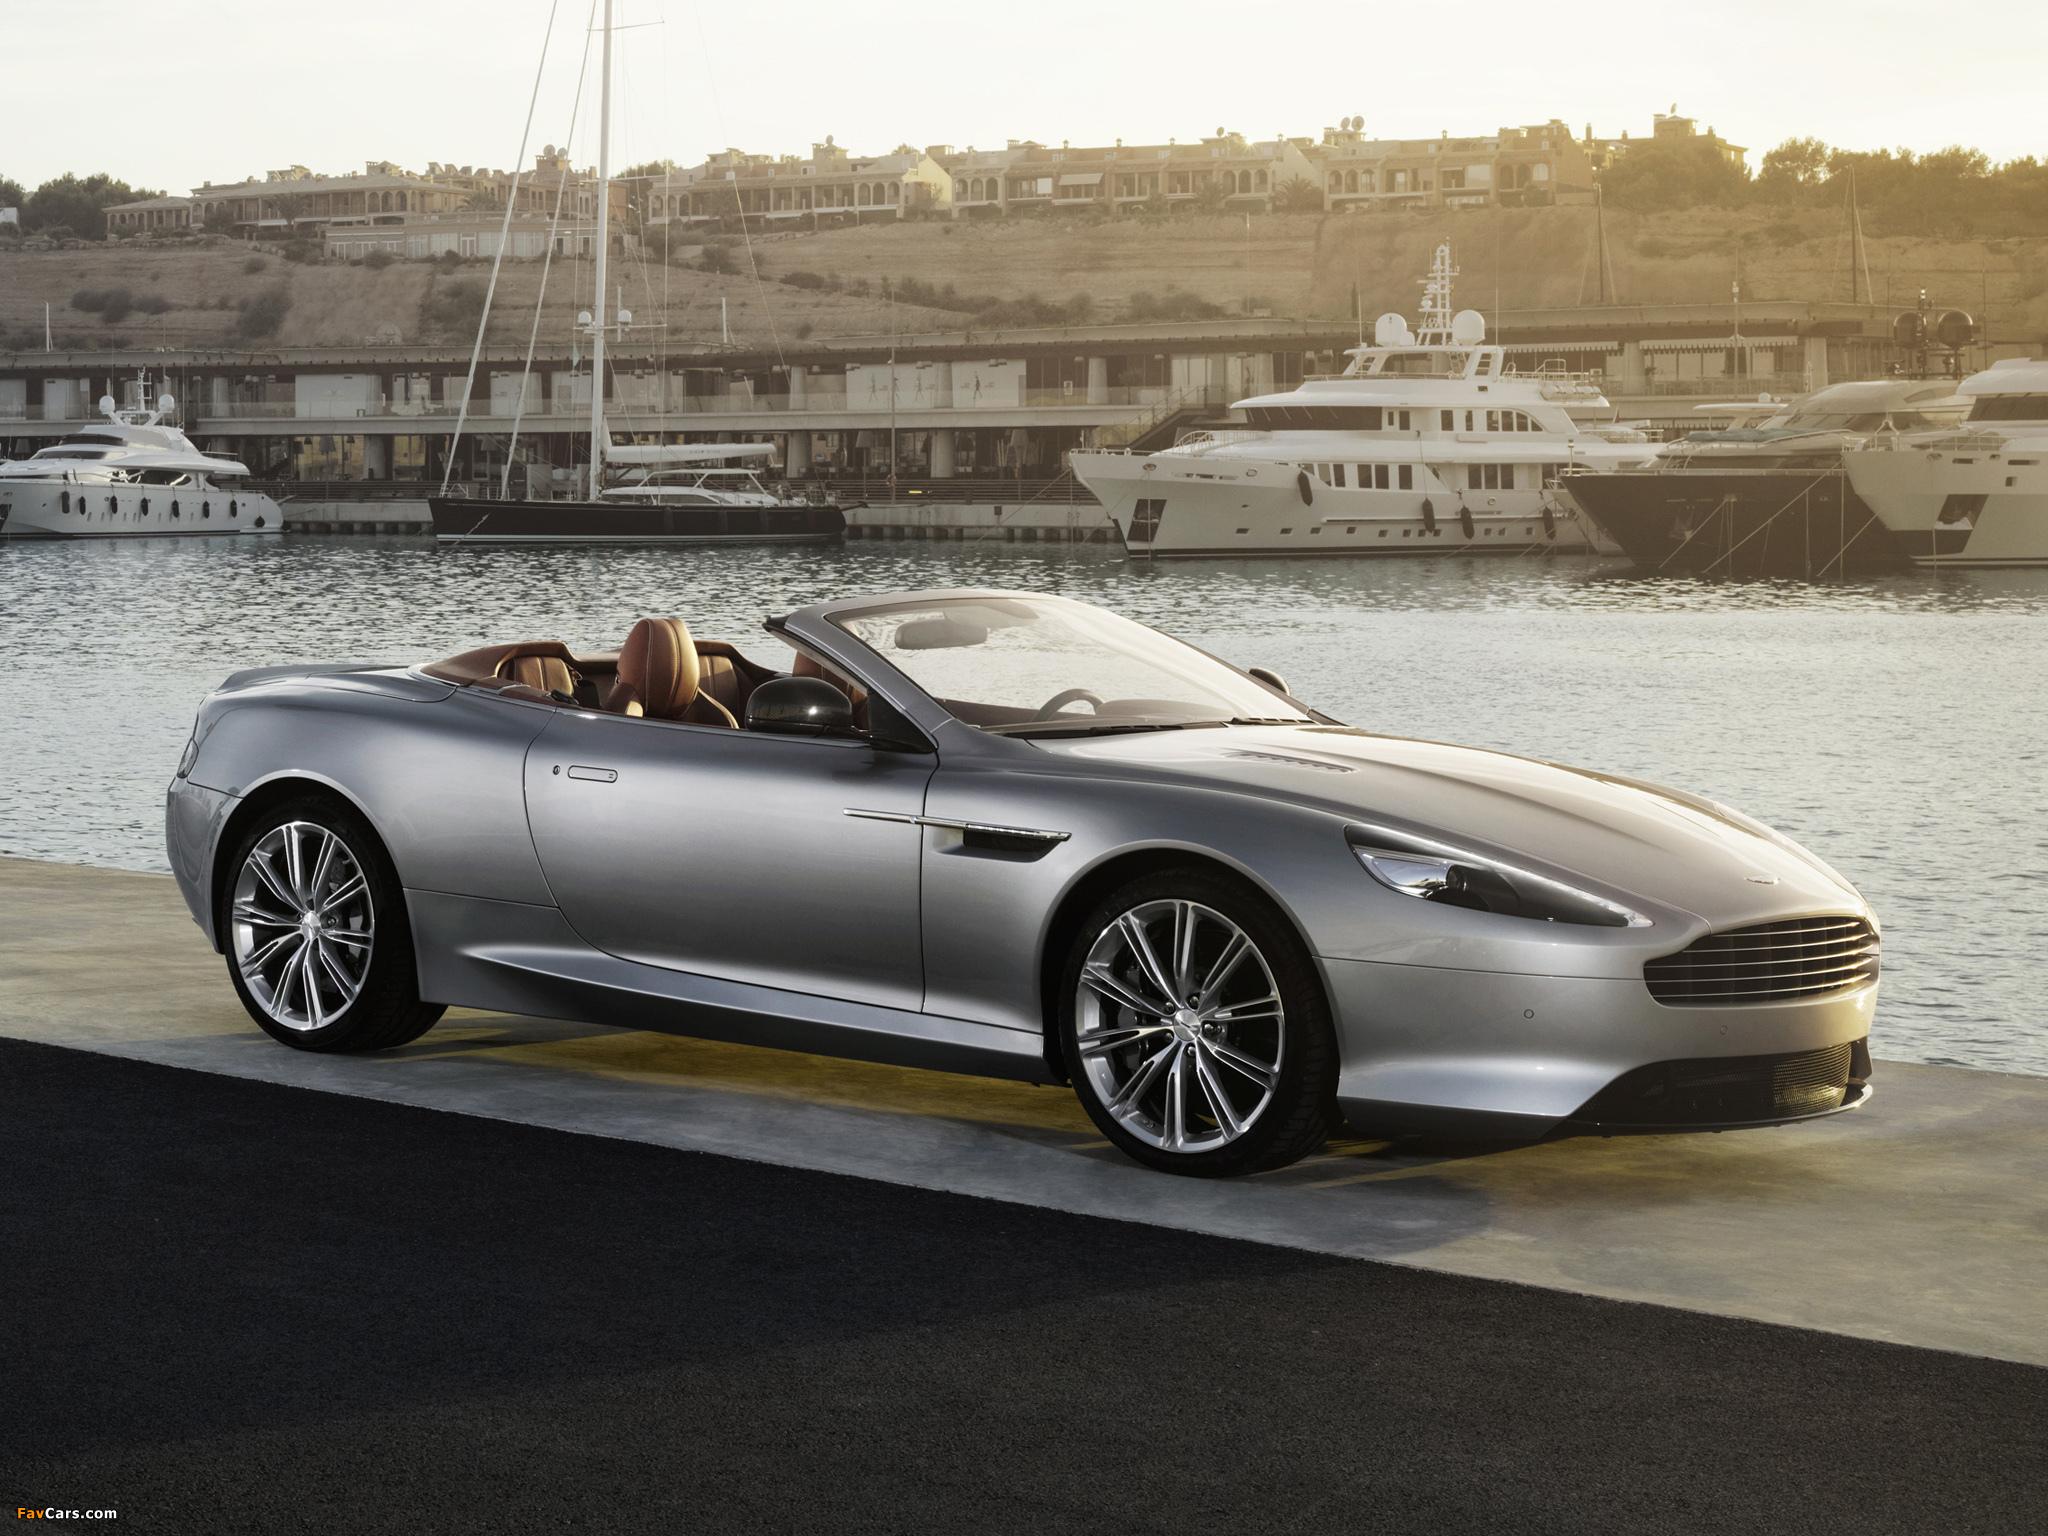 Aston Martin DB Volante Images - Aston martin db9 volante